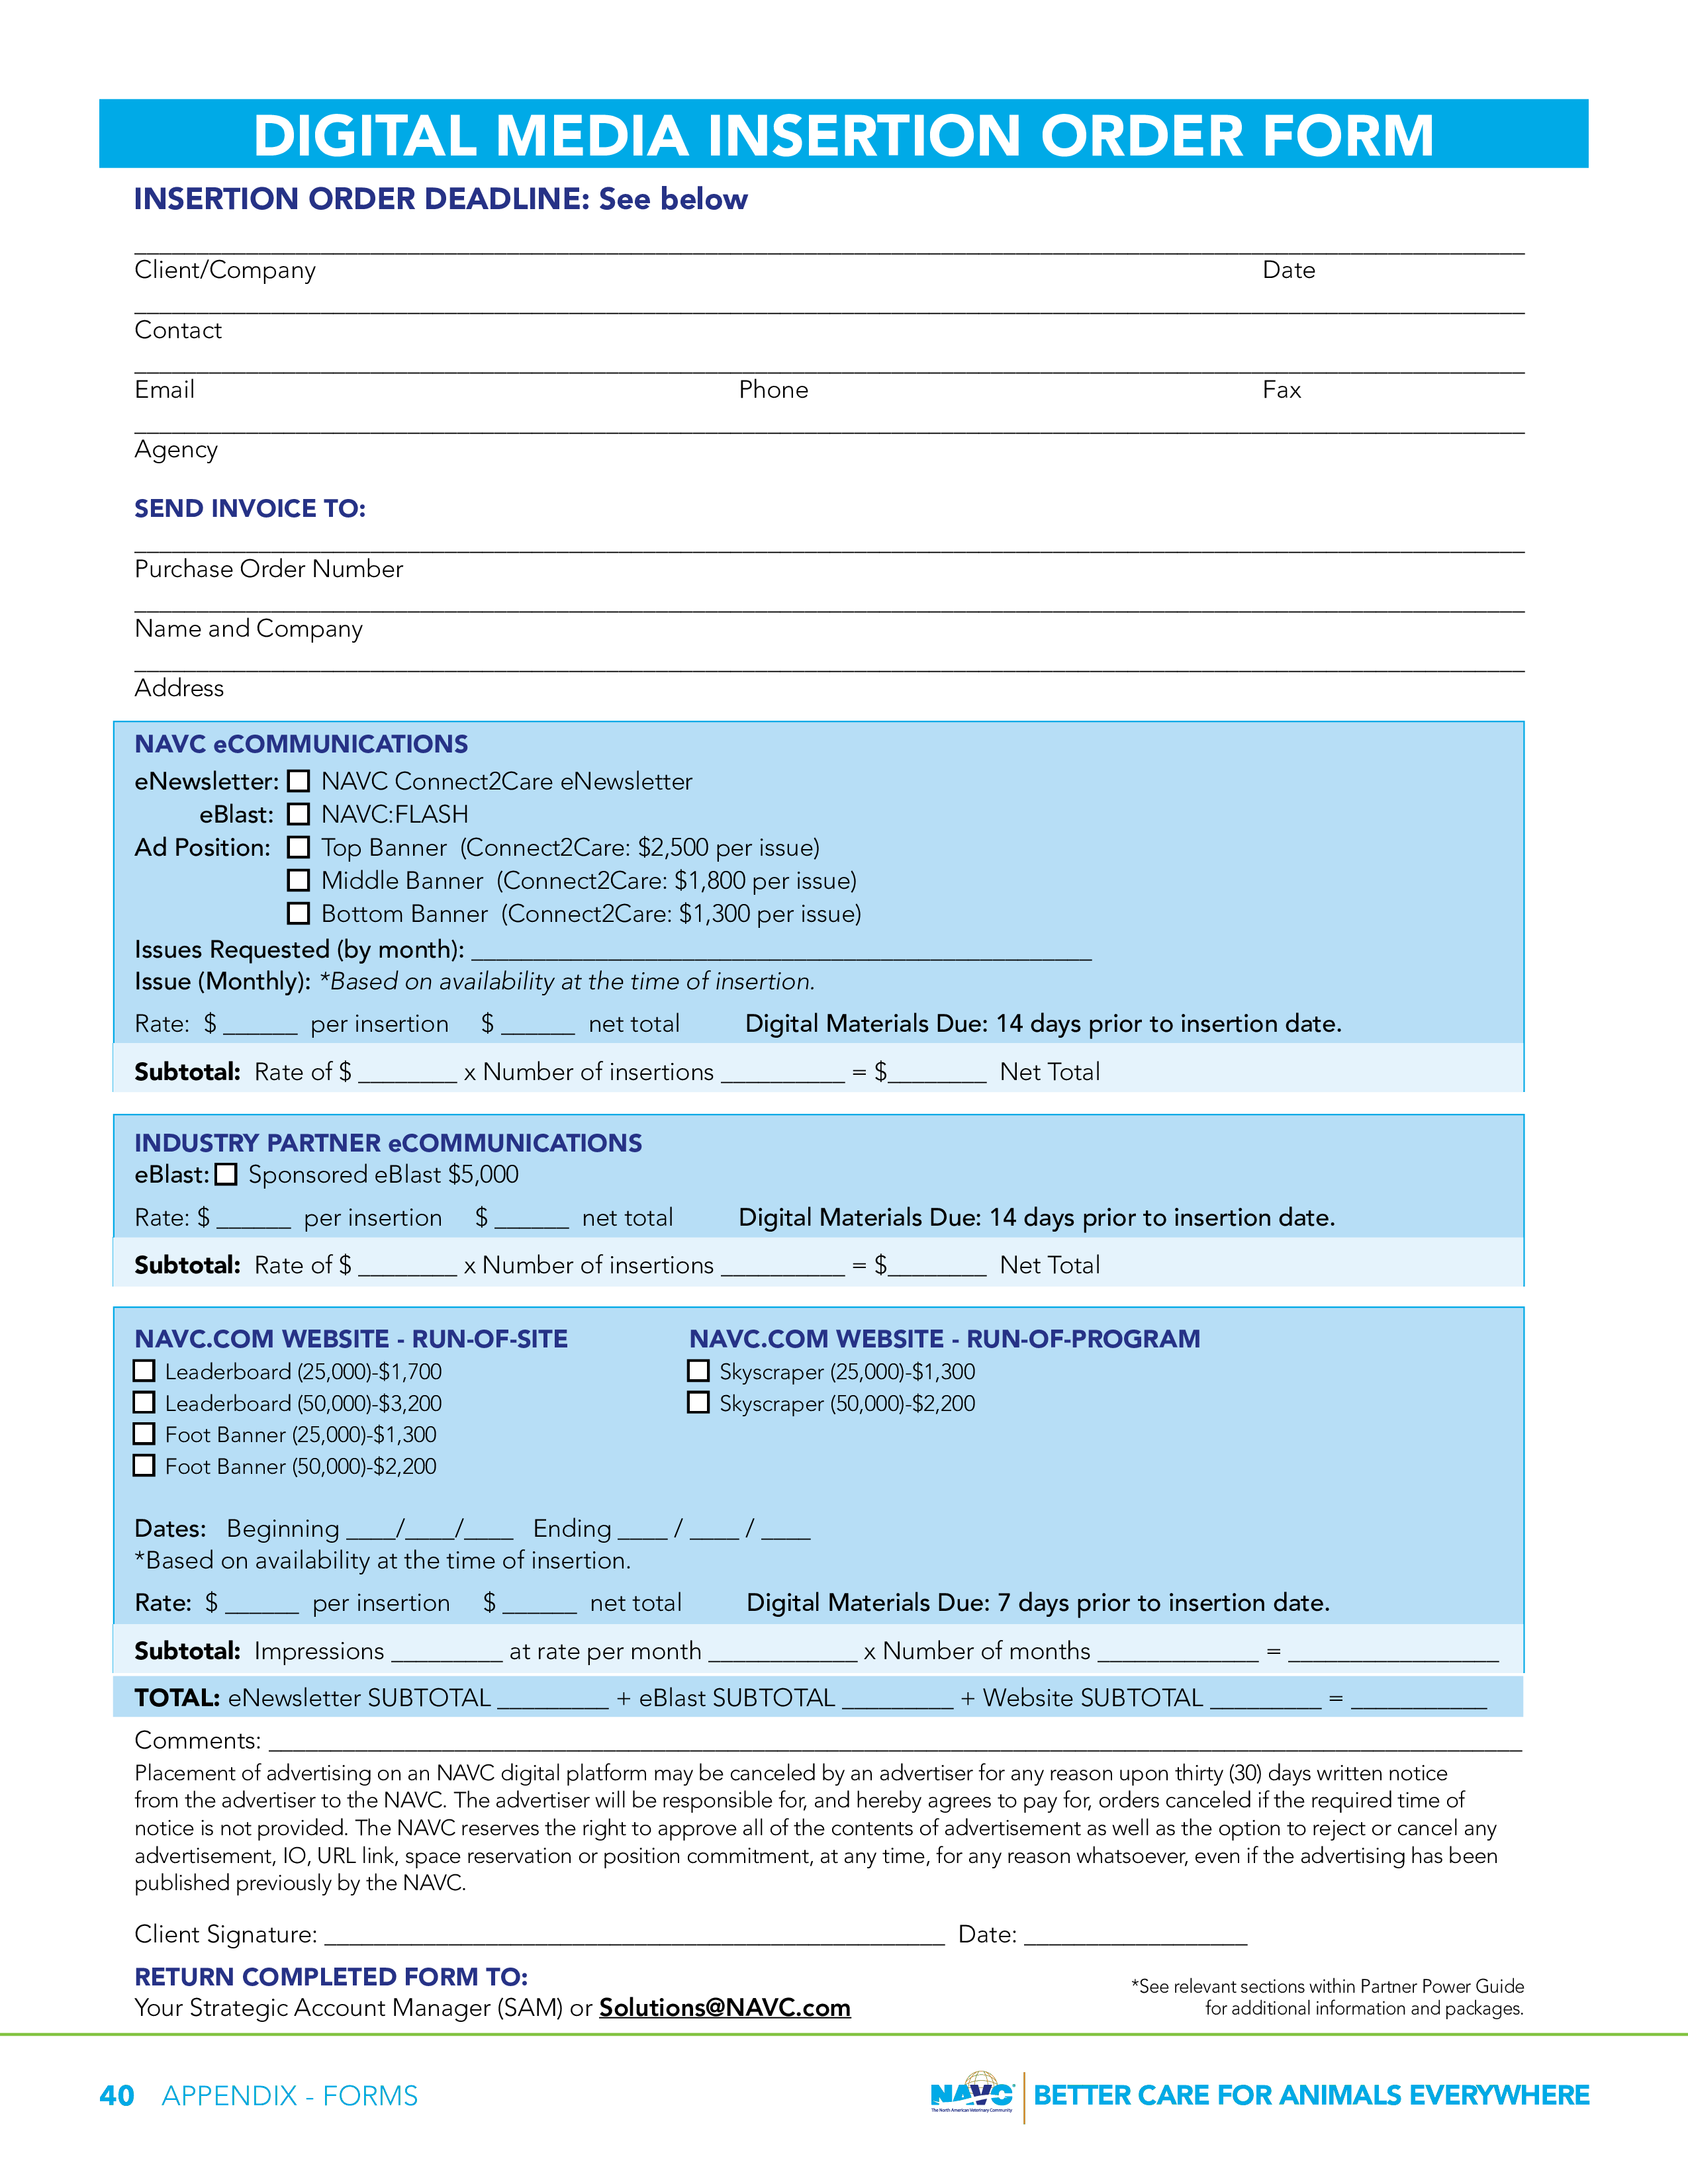 Insertion Order Template   Free Digital Media Insertion Order Templates At